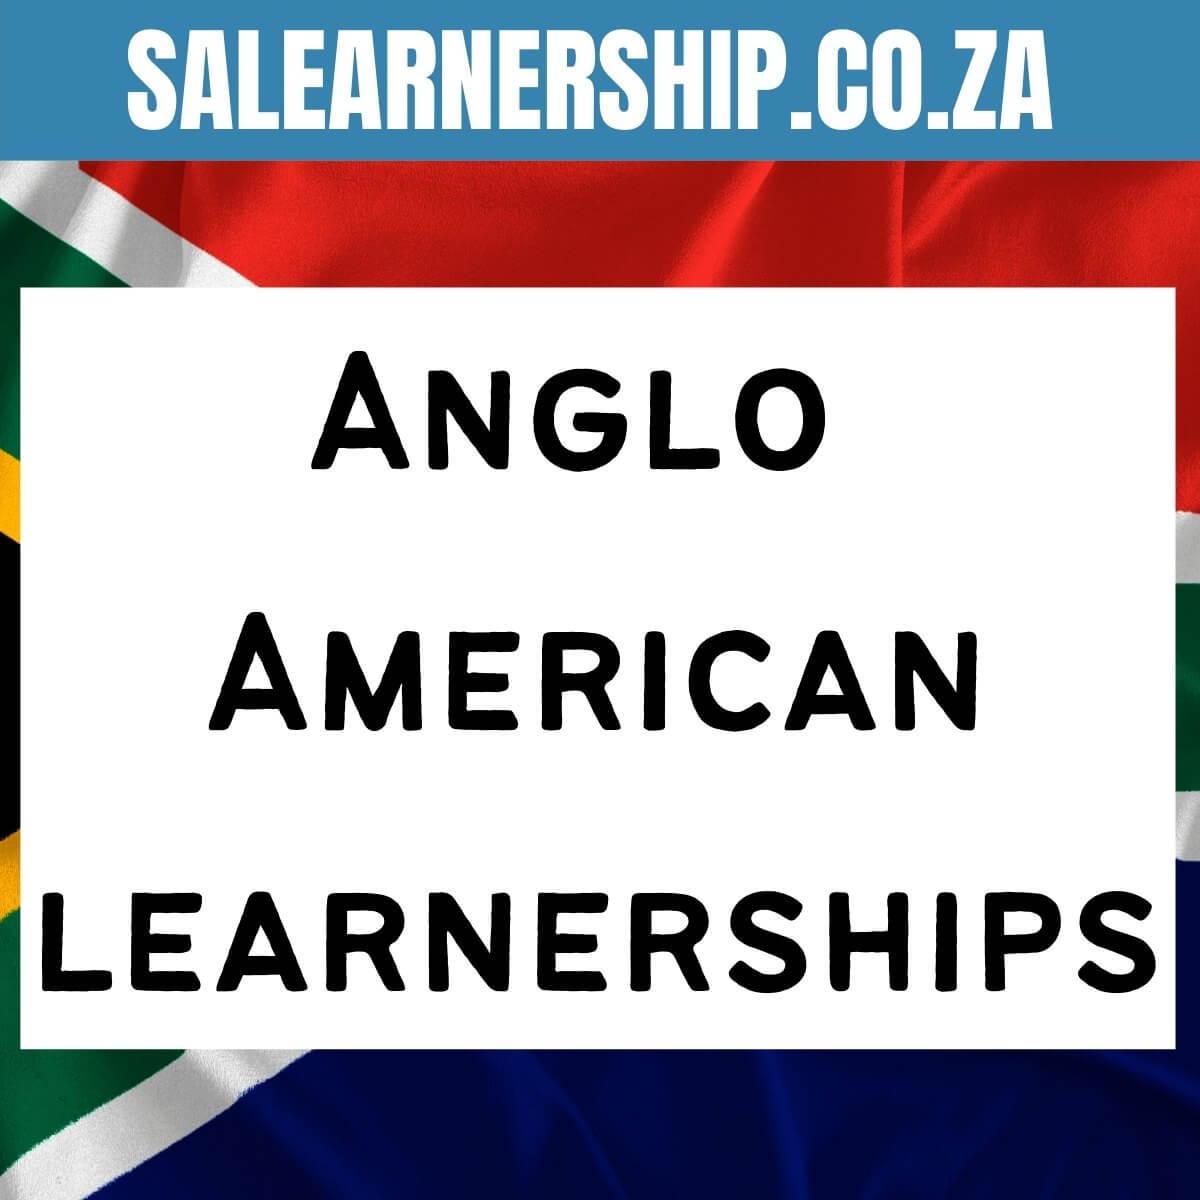 Anglo American learnerships